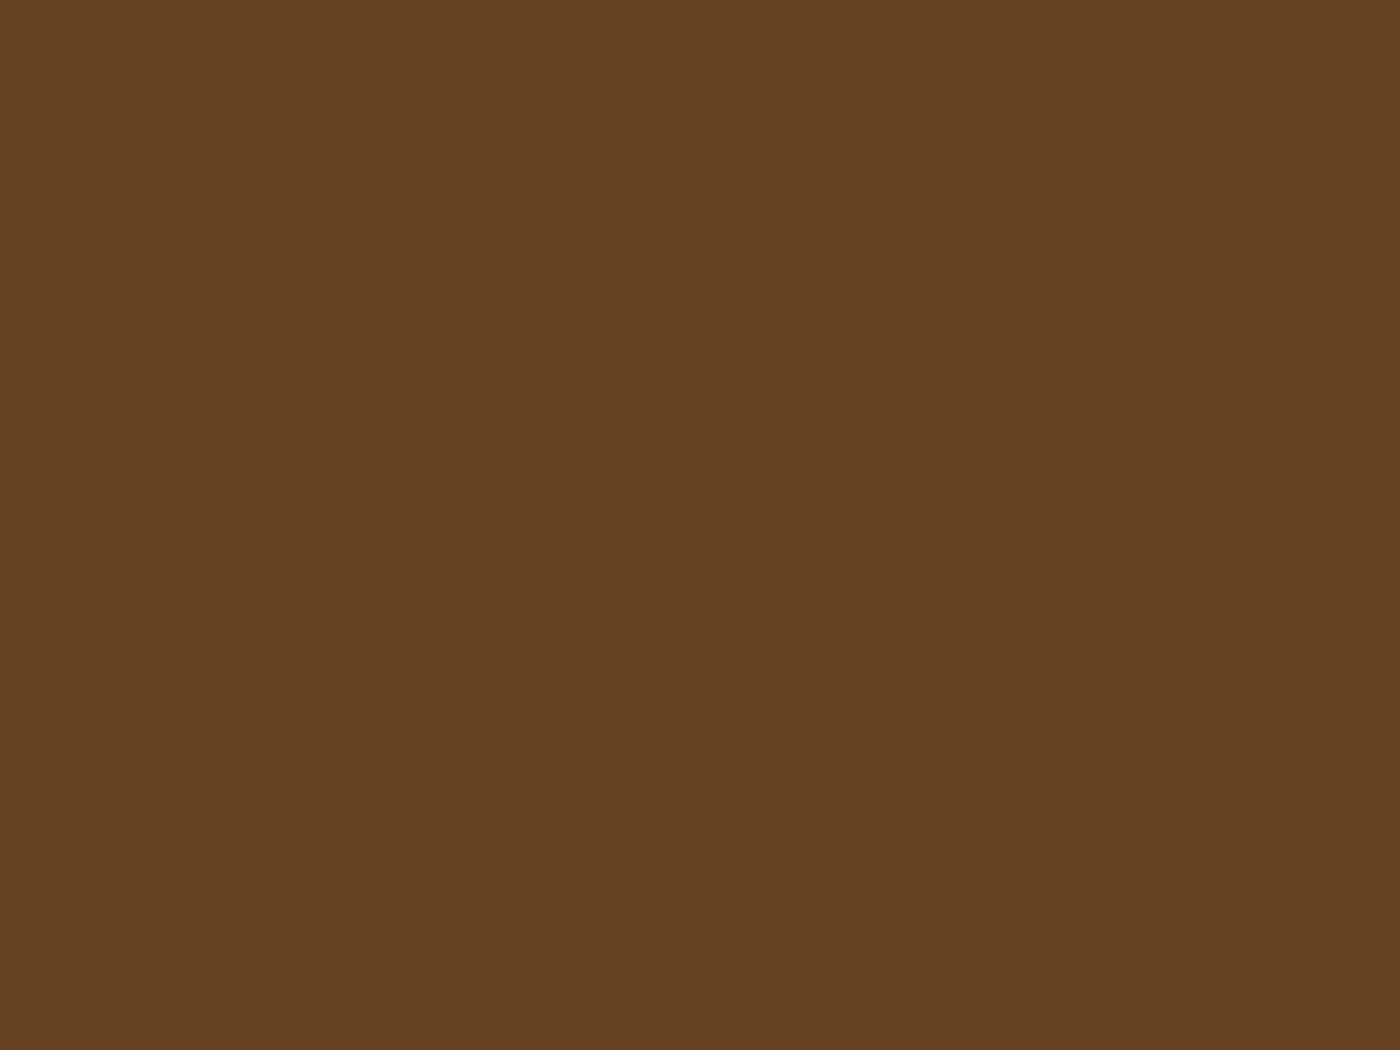 1400x1050 Dark Brown Solid Color Background